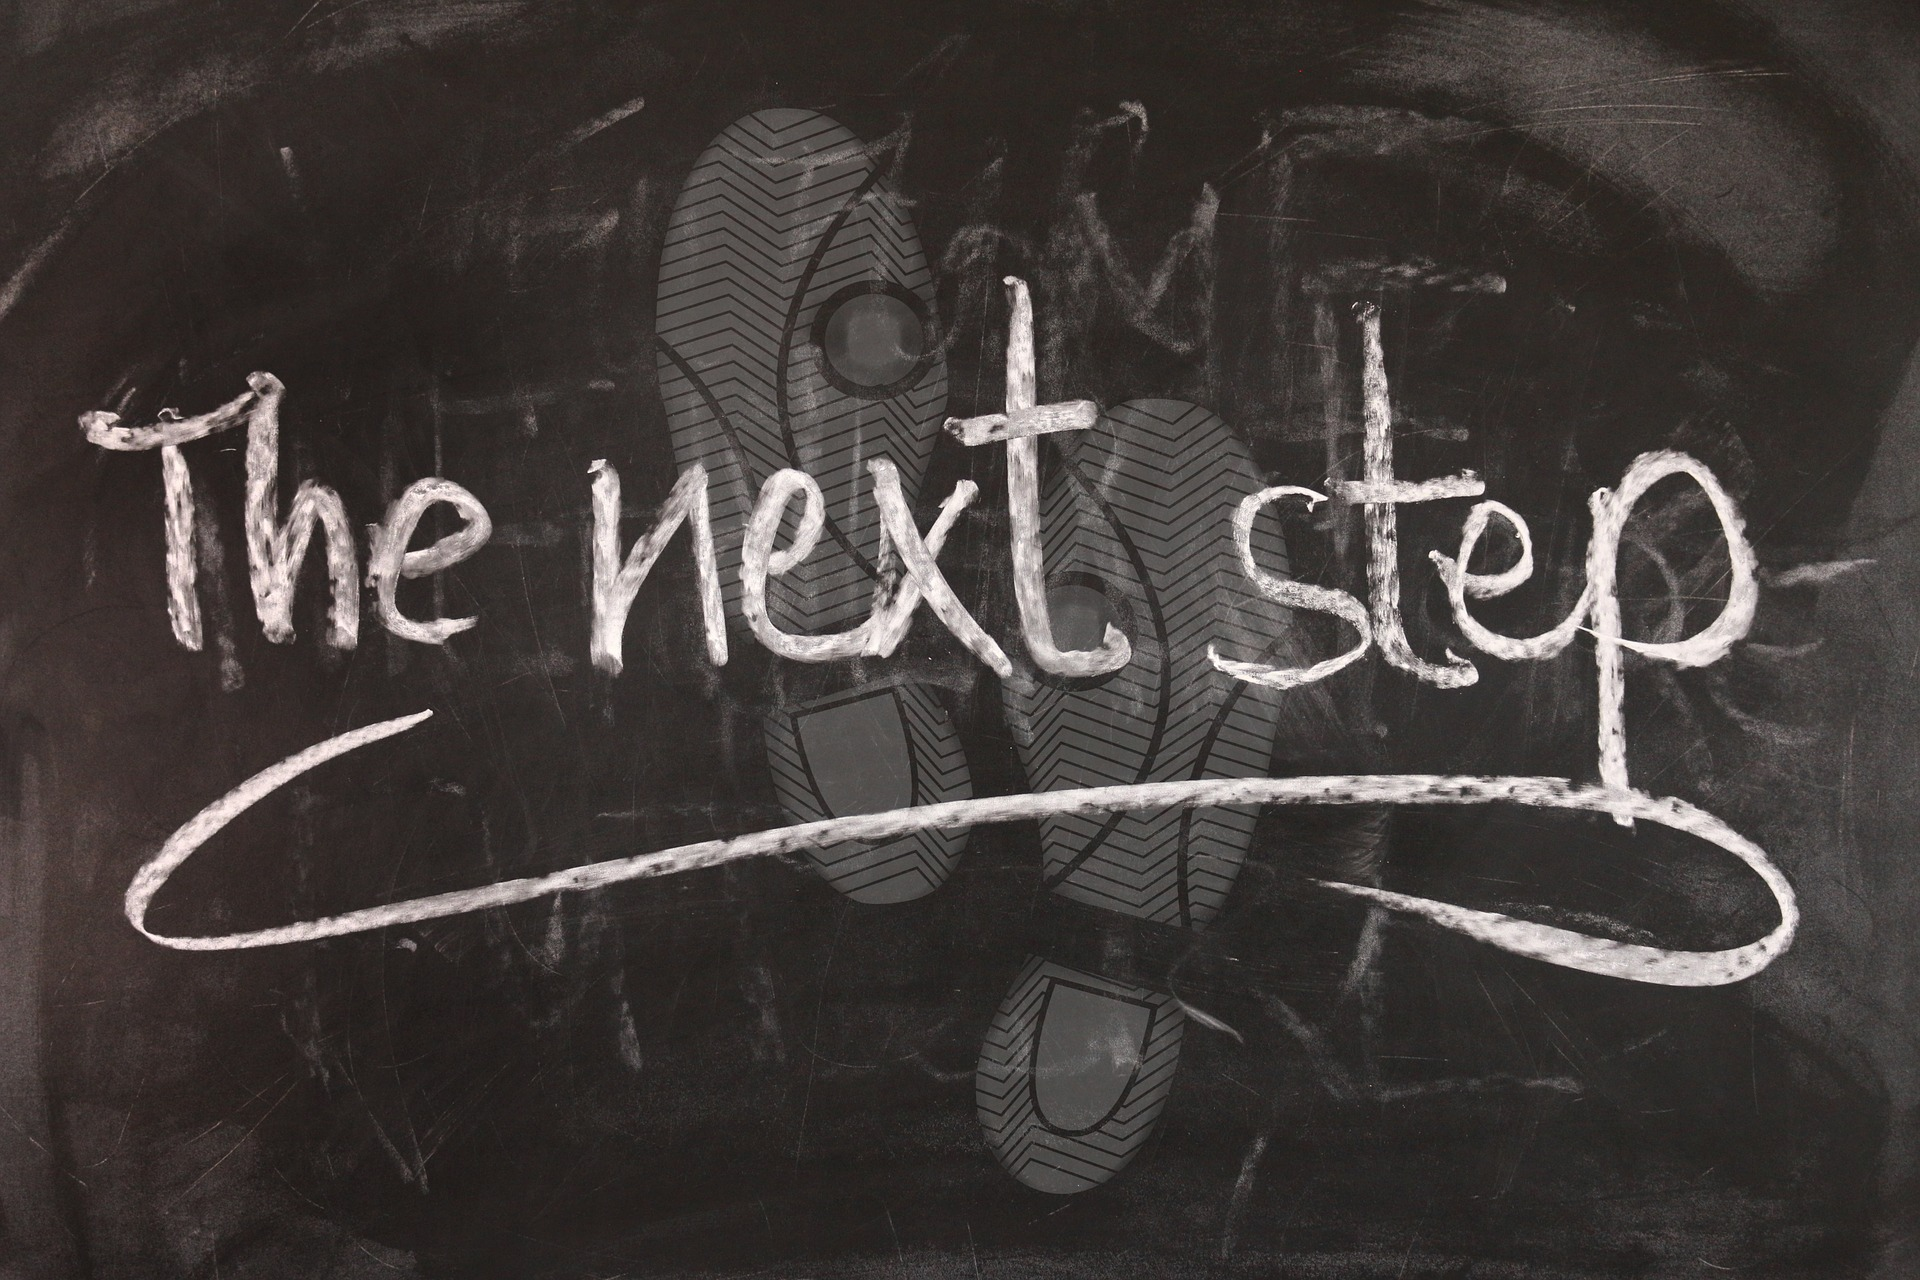 The next step written on a chalkboard